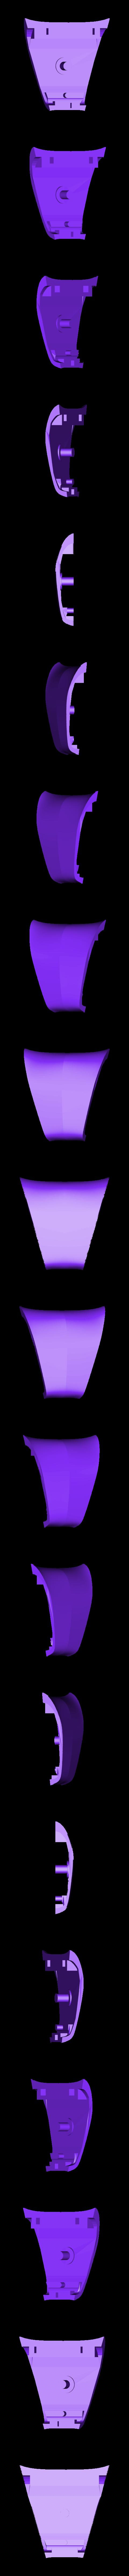 CENTER BOT.stl Download STL file Gaming Grip for Smartphones • 3D printing template, SOLIDMaker3D